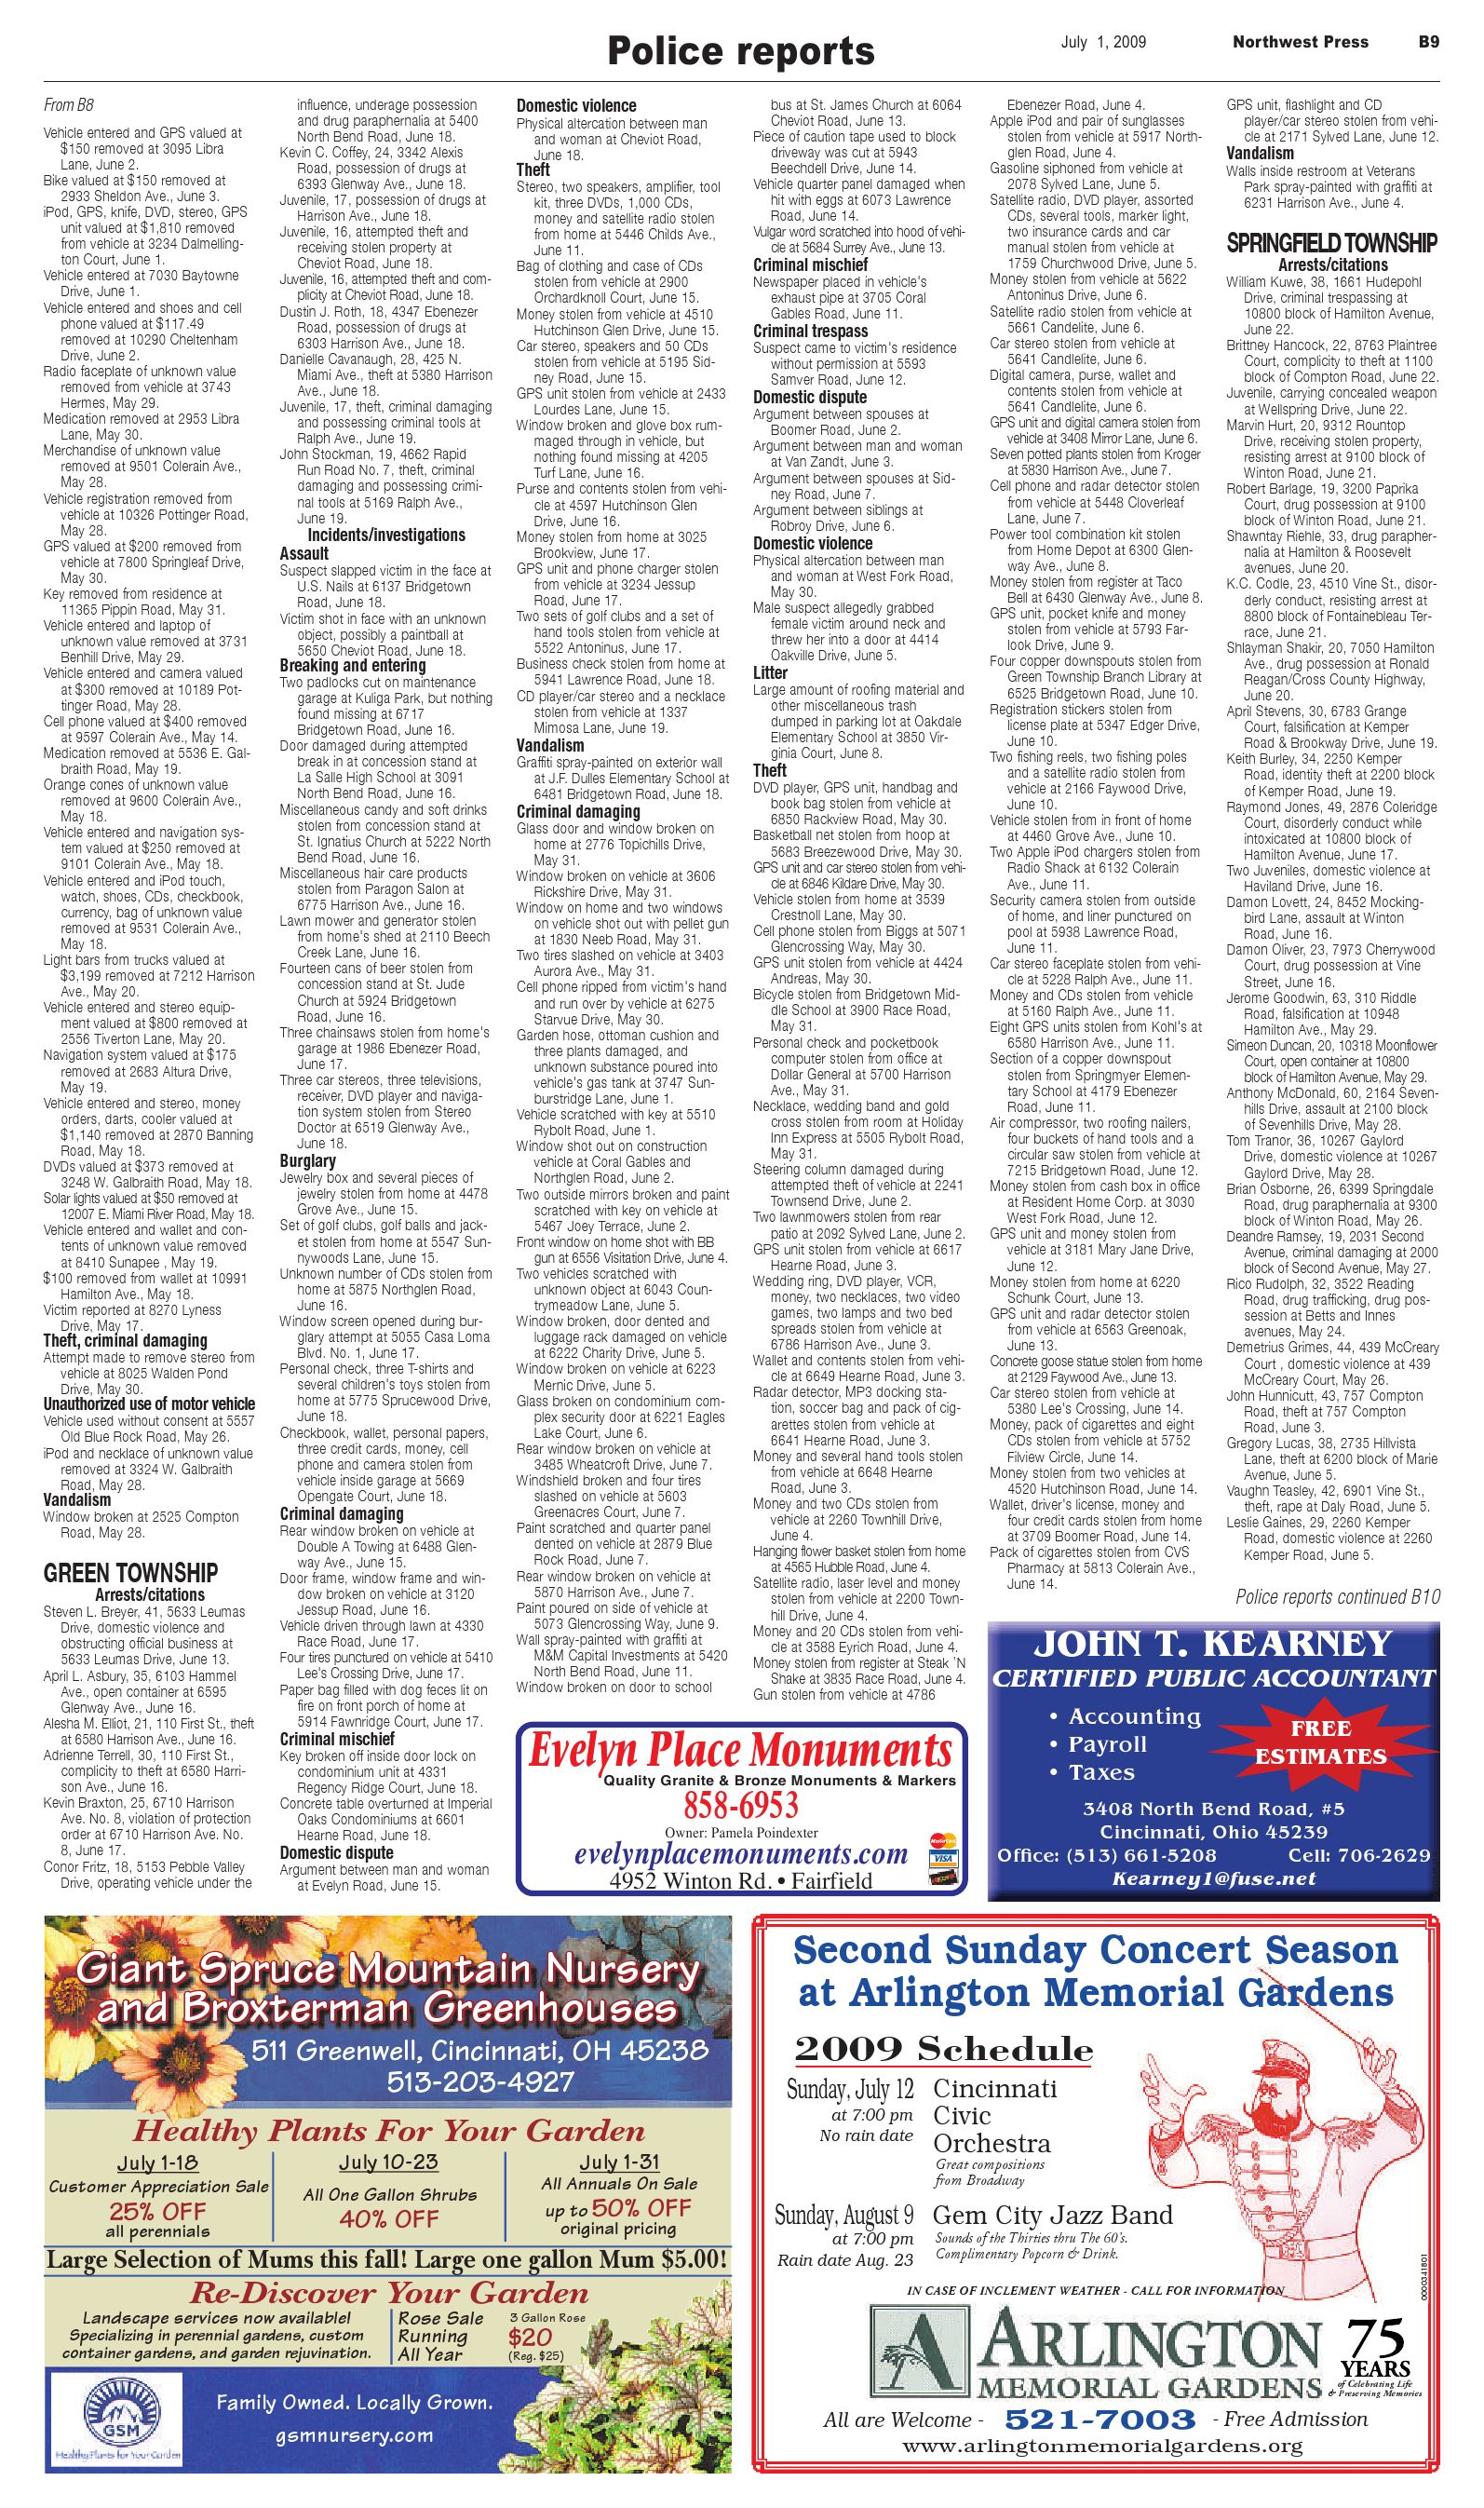 55ee9740a5 Northwest Press - July 1